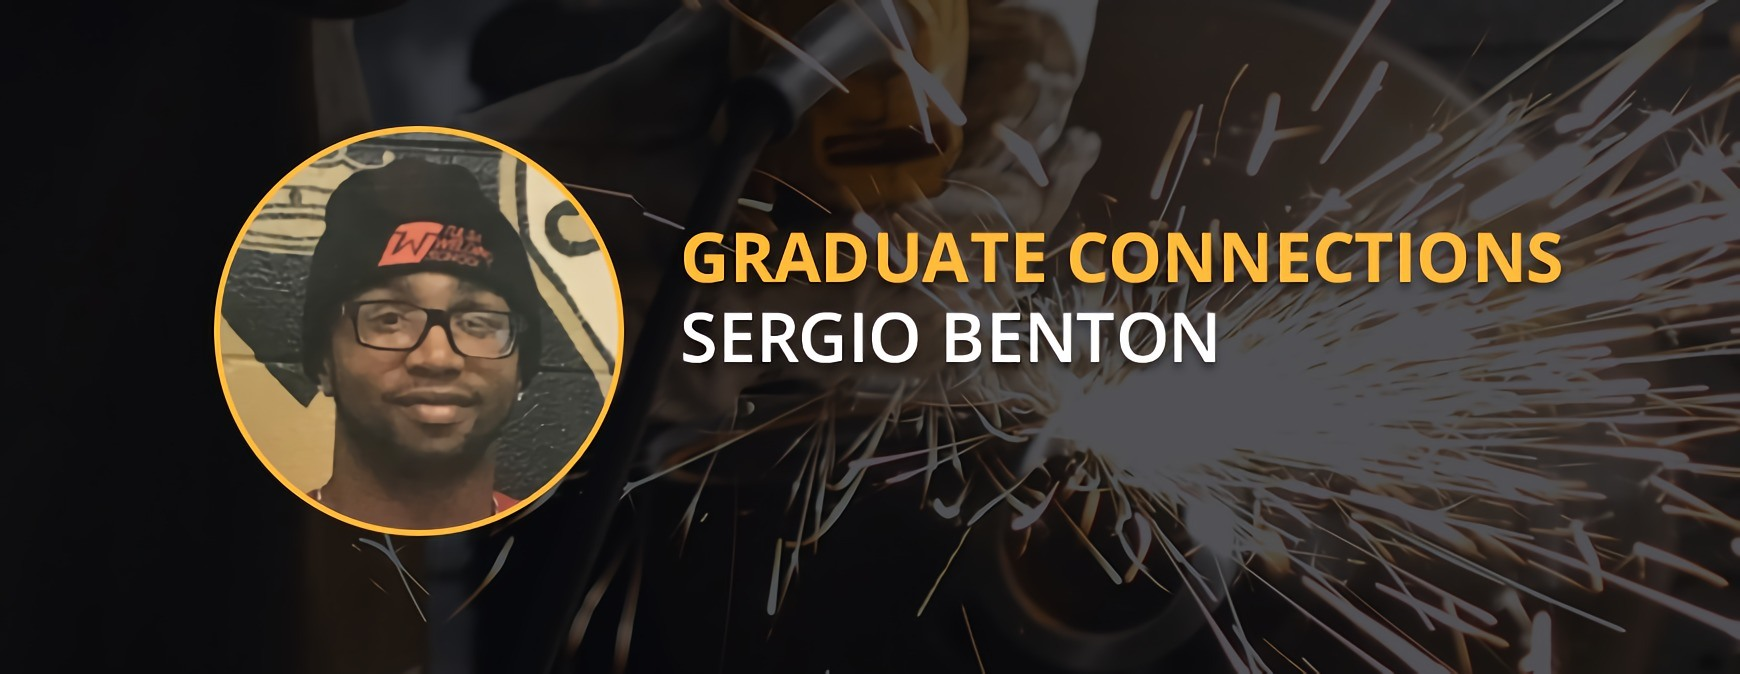 Sergio Benton